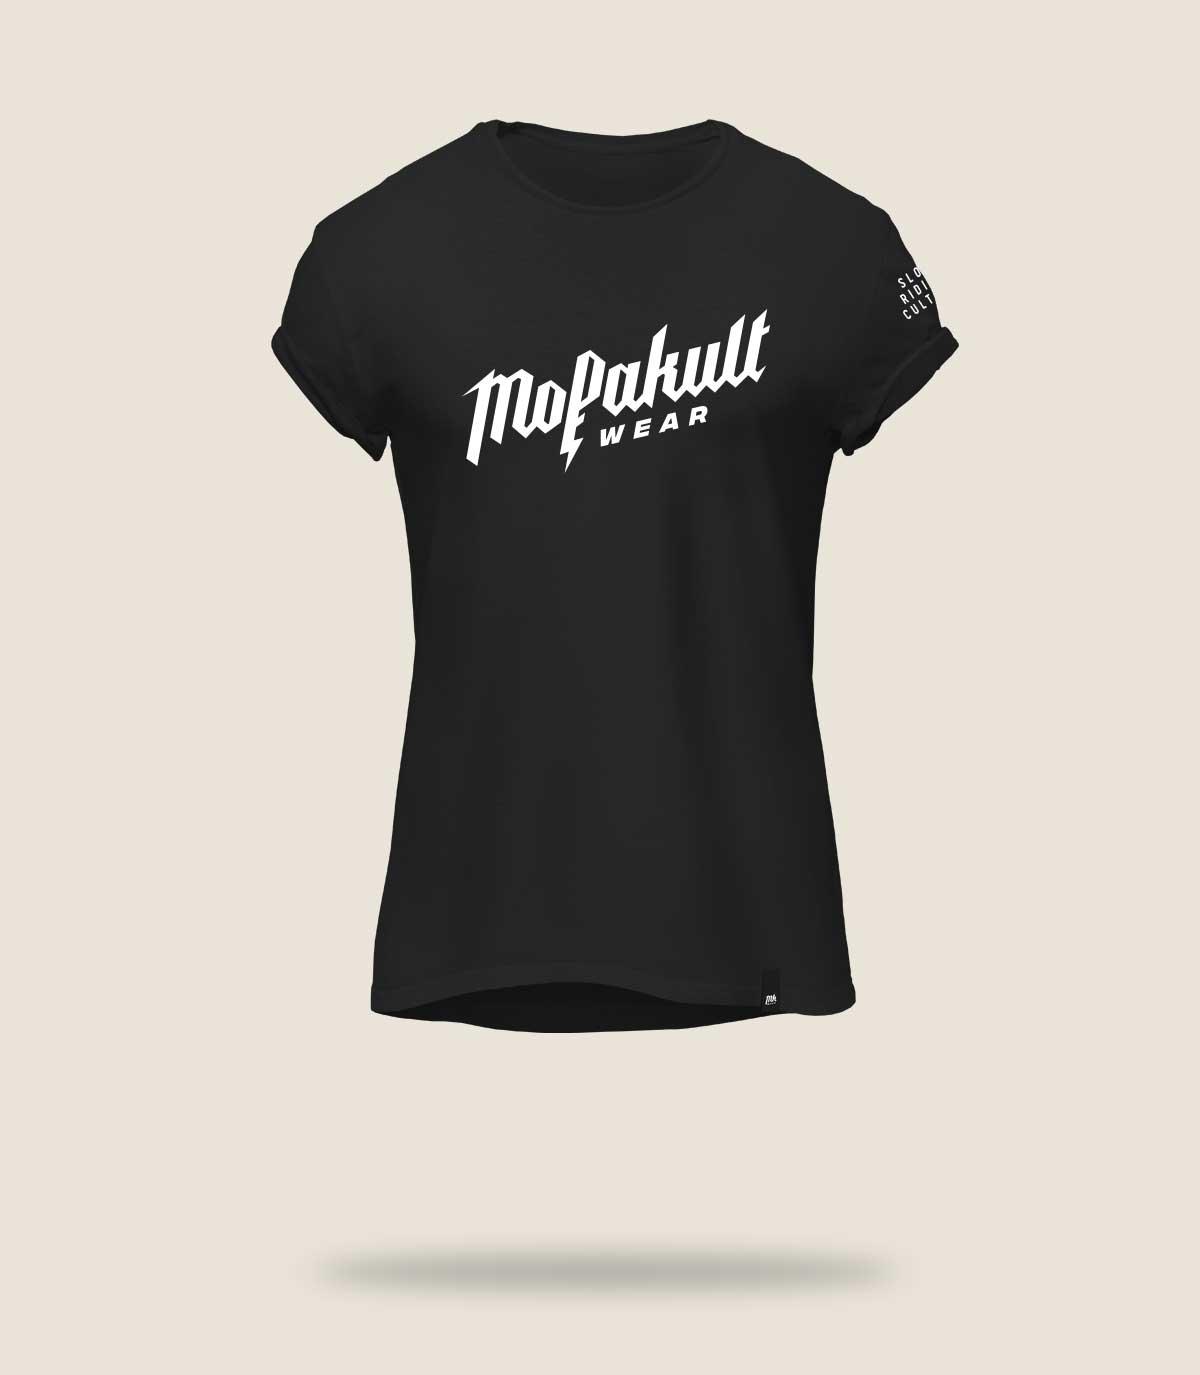 Mofakultwear Man Shirt Black